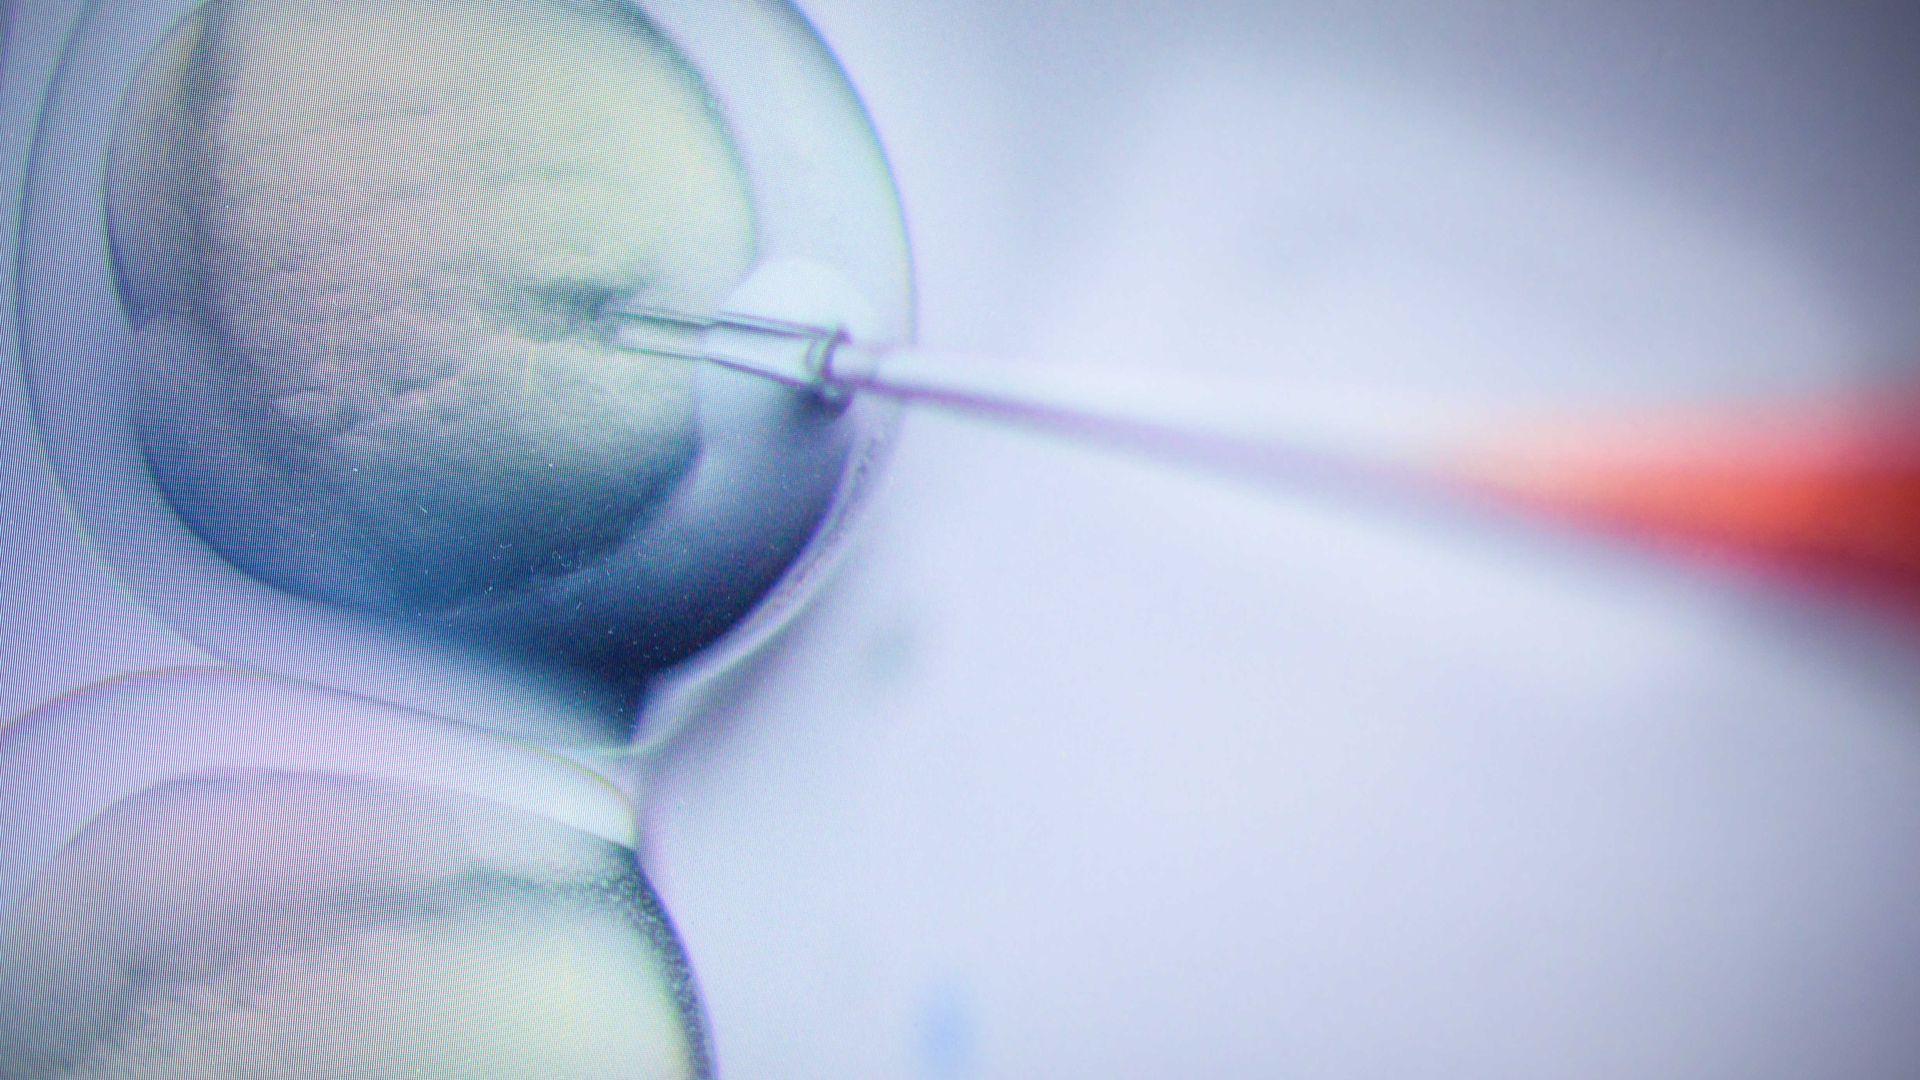 CRISPR gene-editing tool